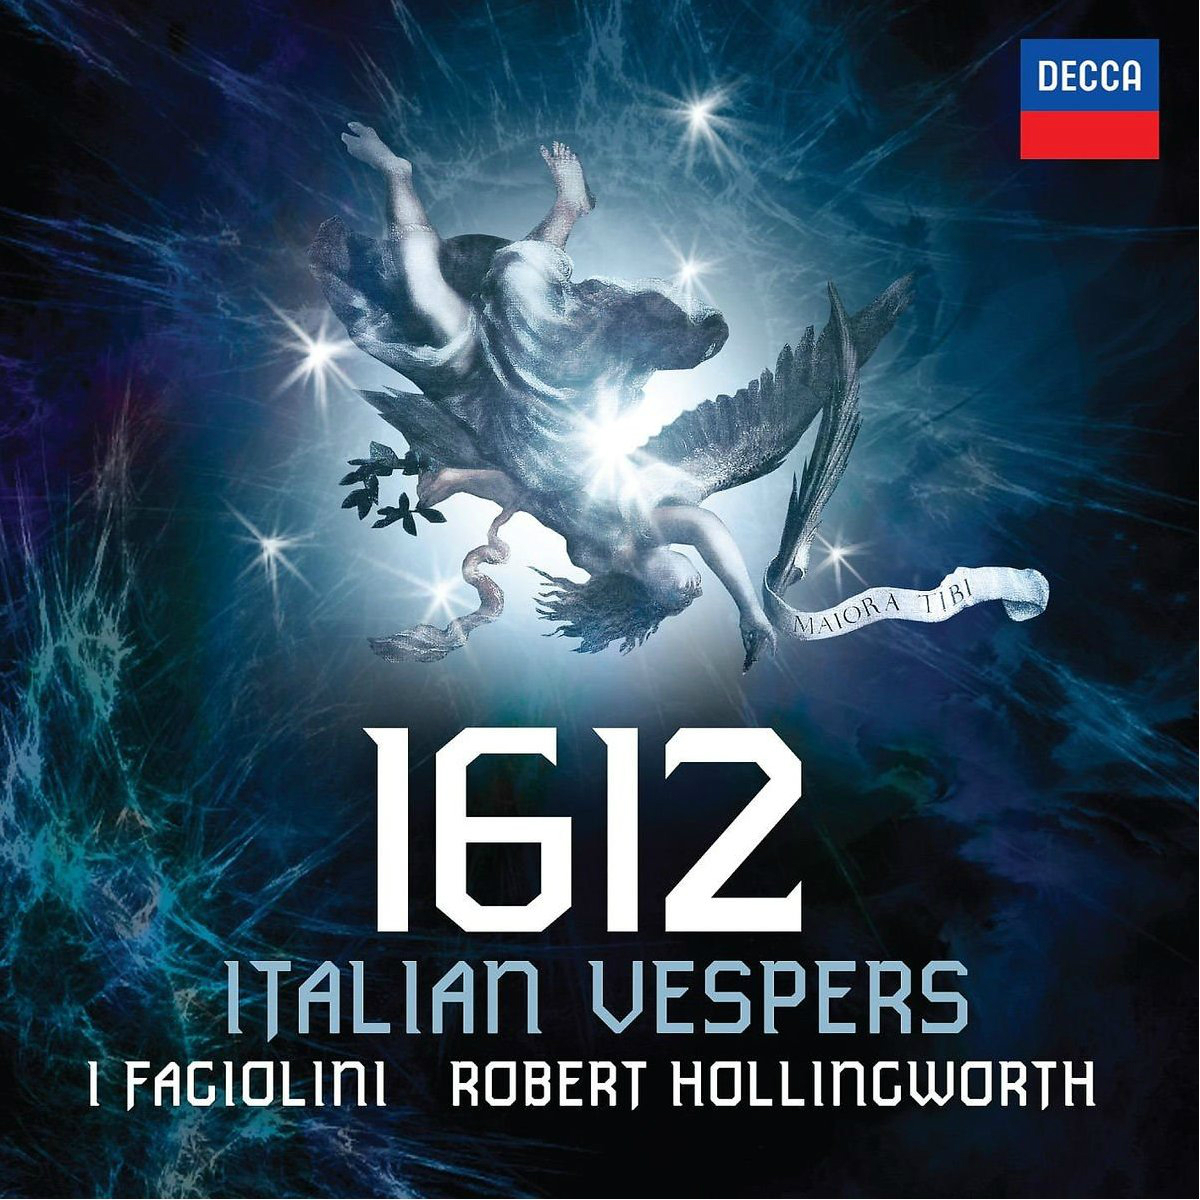 '1612 Italian Vespers' CD cover